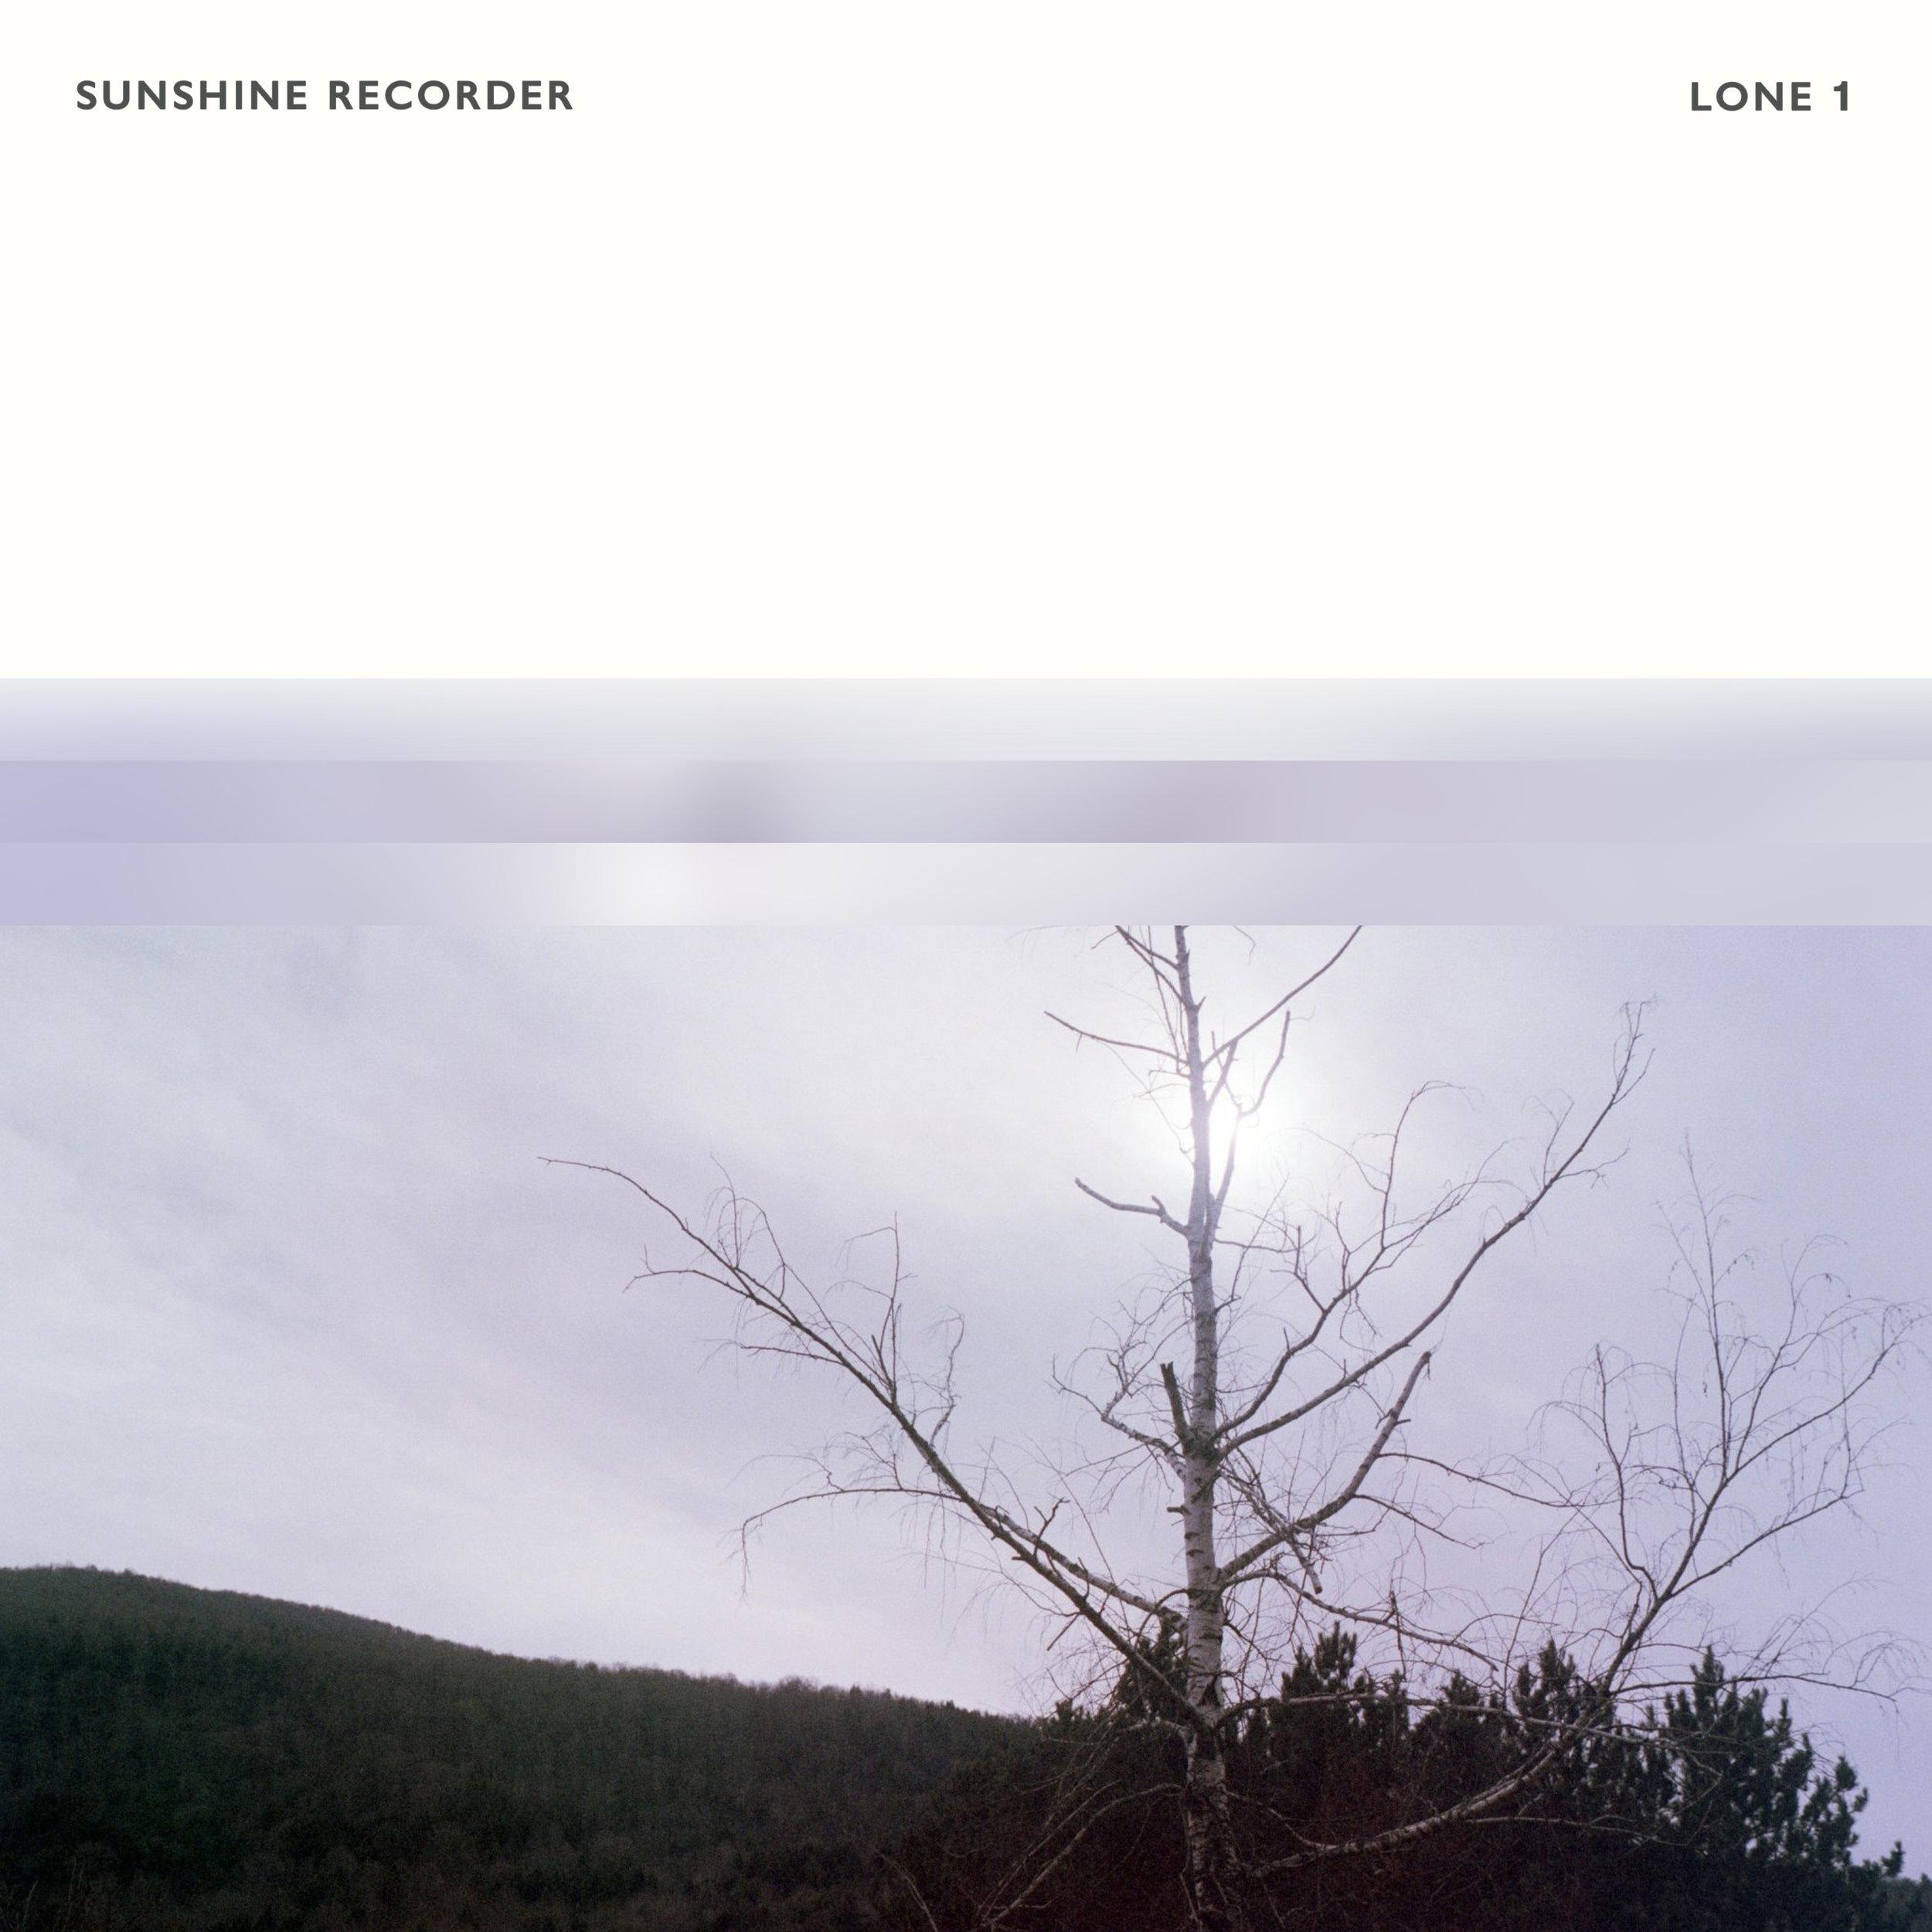 Sunshine Recorder - Lone 1